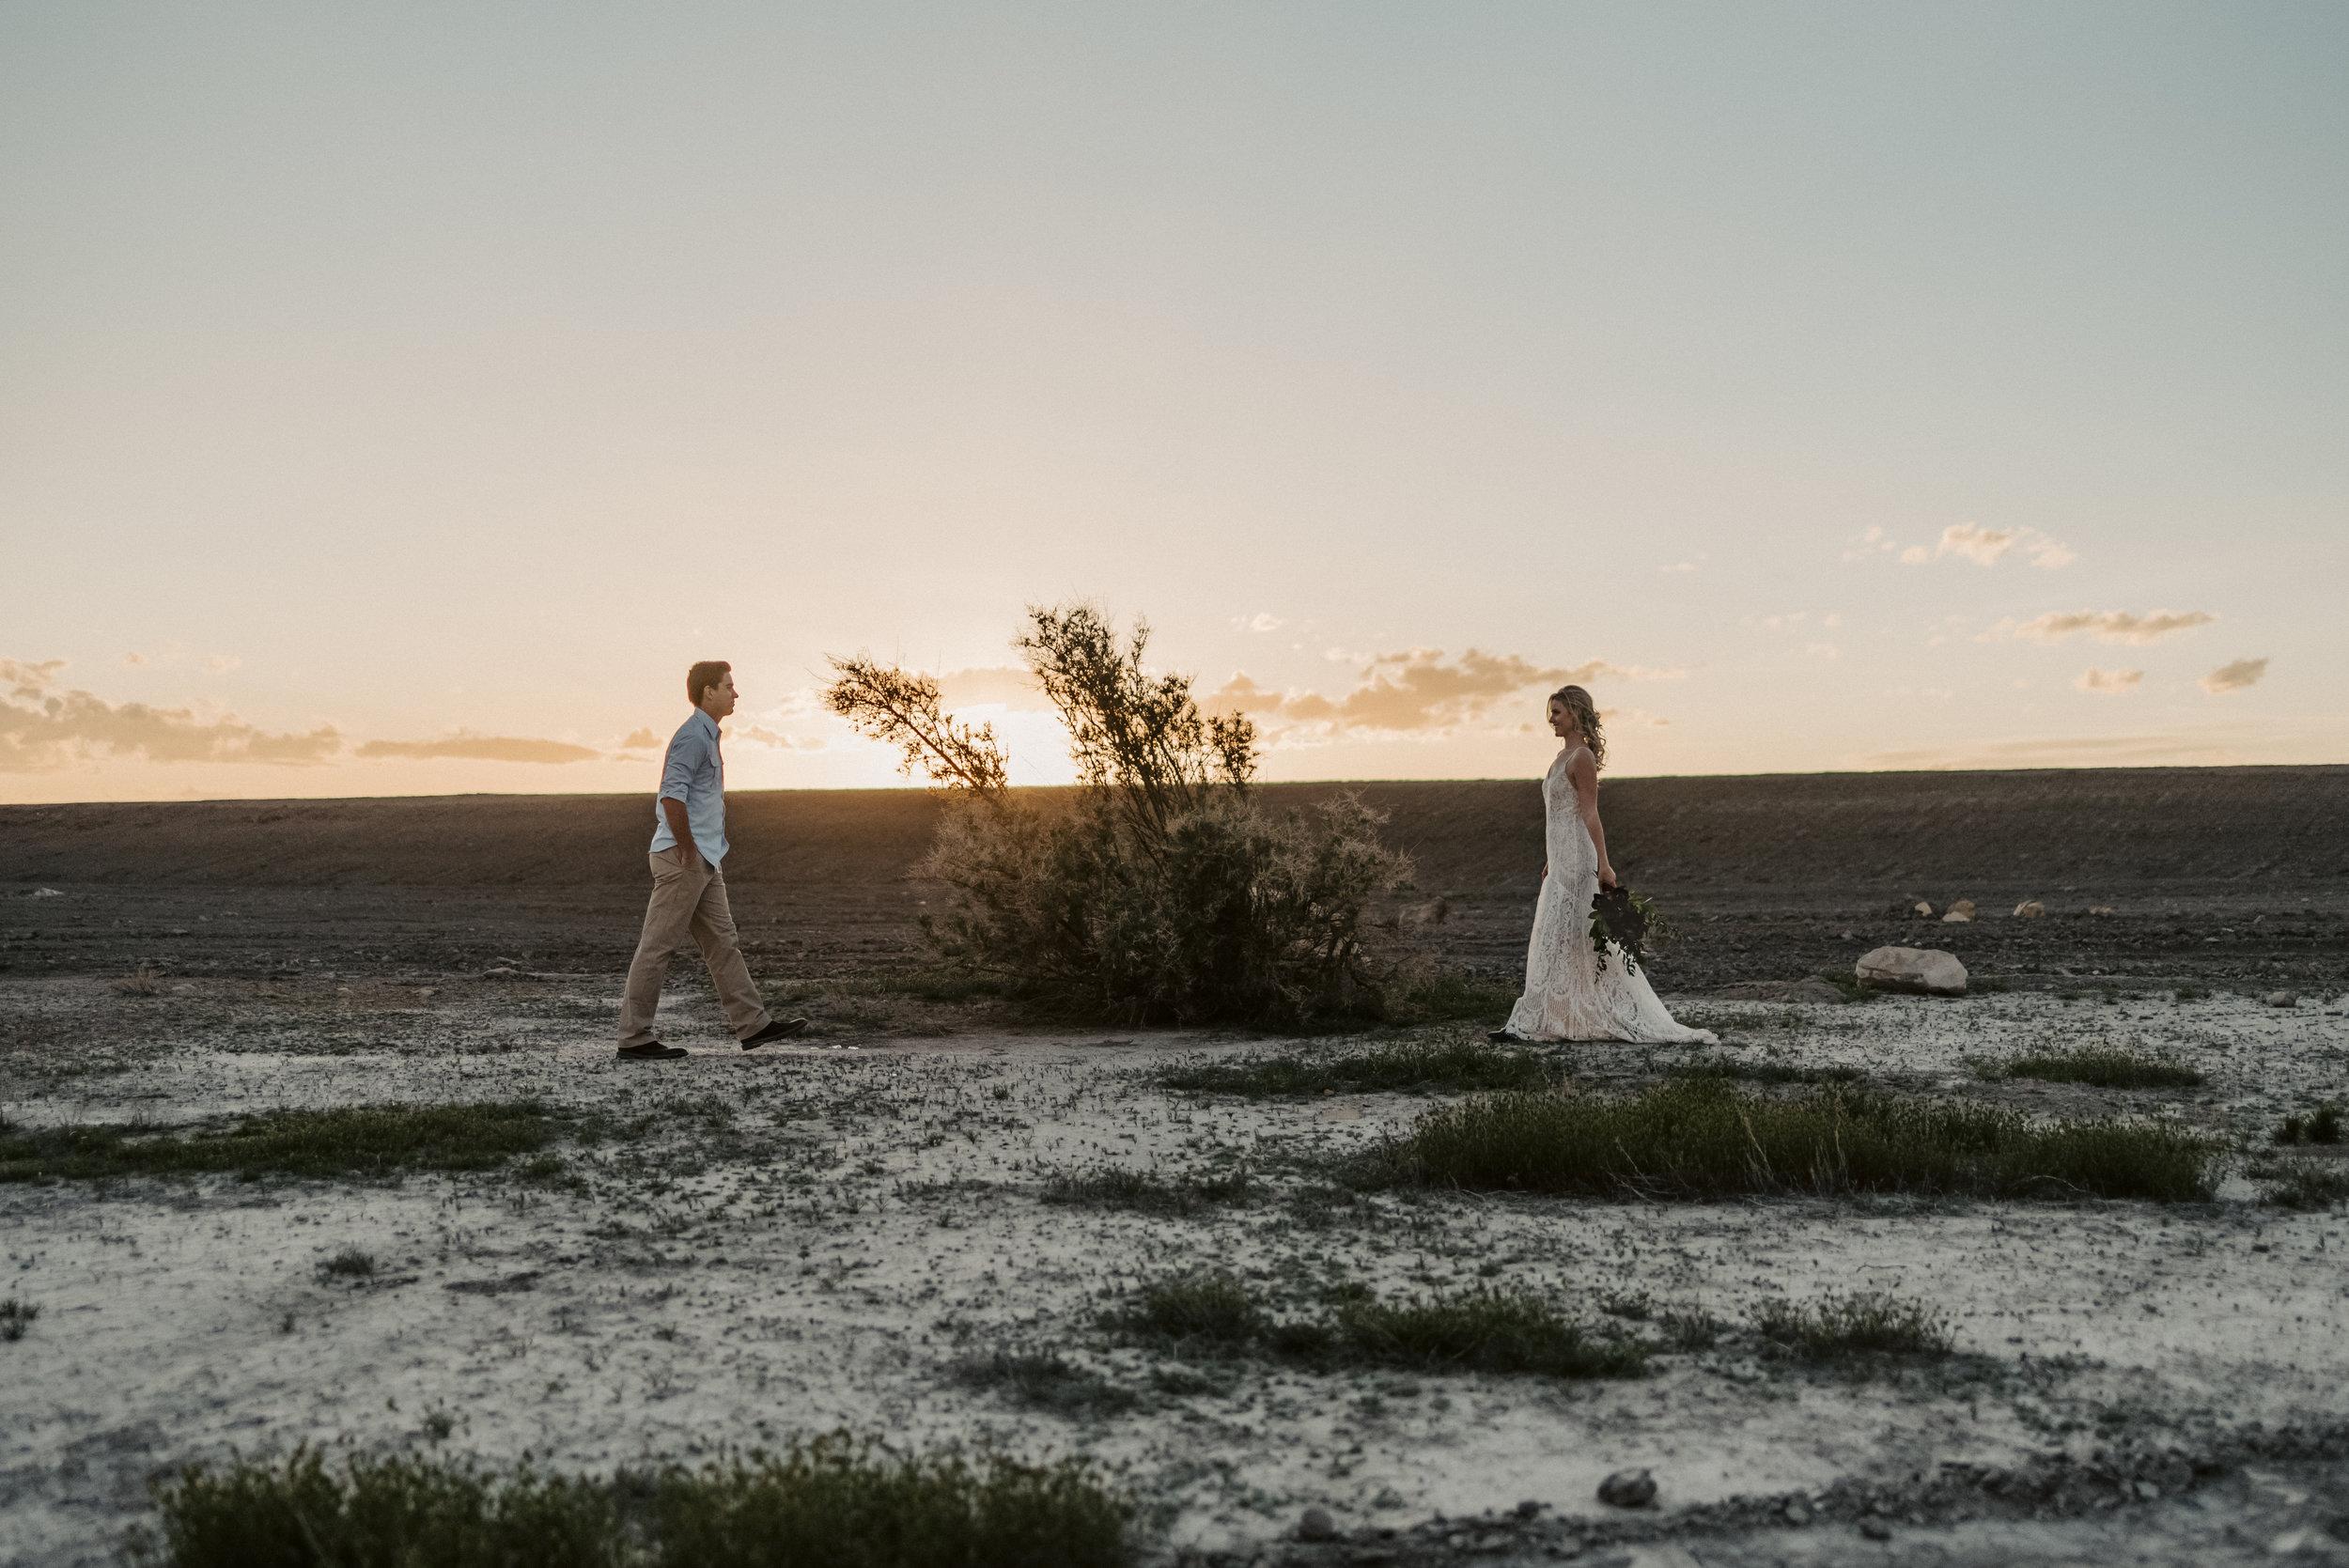 Telluride + Grand Junction + Denver + Vail + Aspen + Rocky Mountain National Park Wedding Photographer | Desert Elopement Photographer | Colorado Destination Weddings